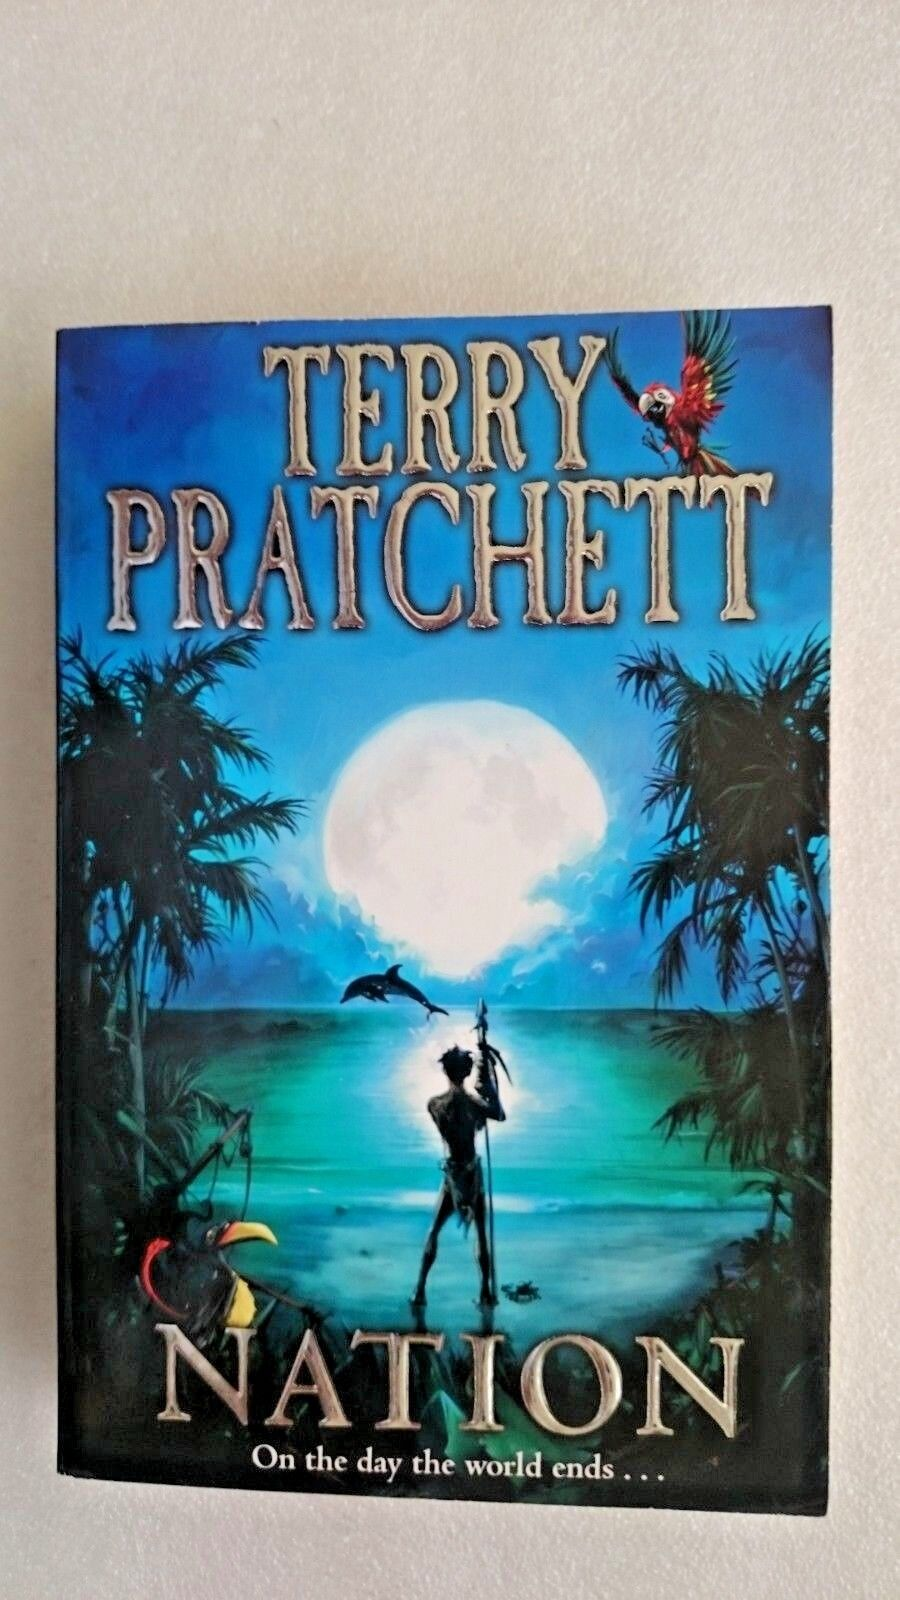 Terry Pratchett: Nation (Paperback 2009) -  A Discworld Novel